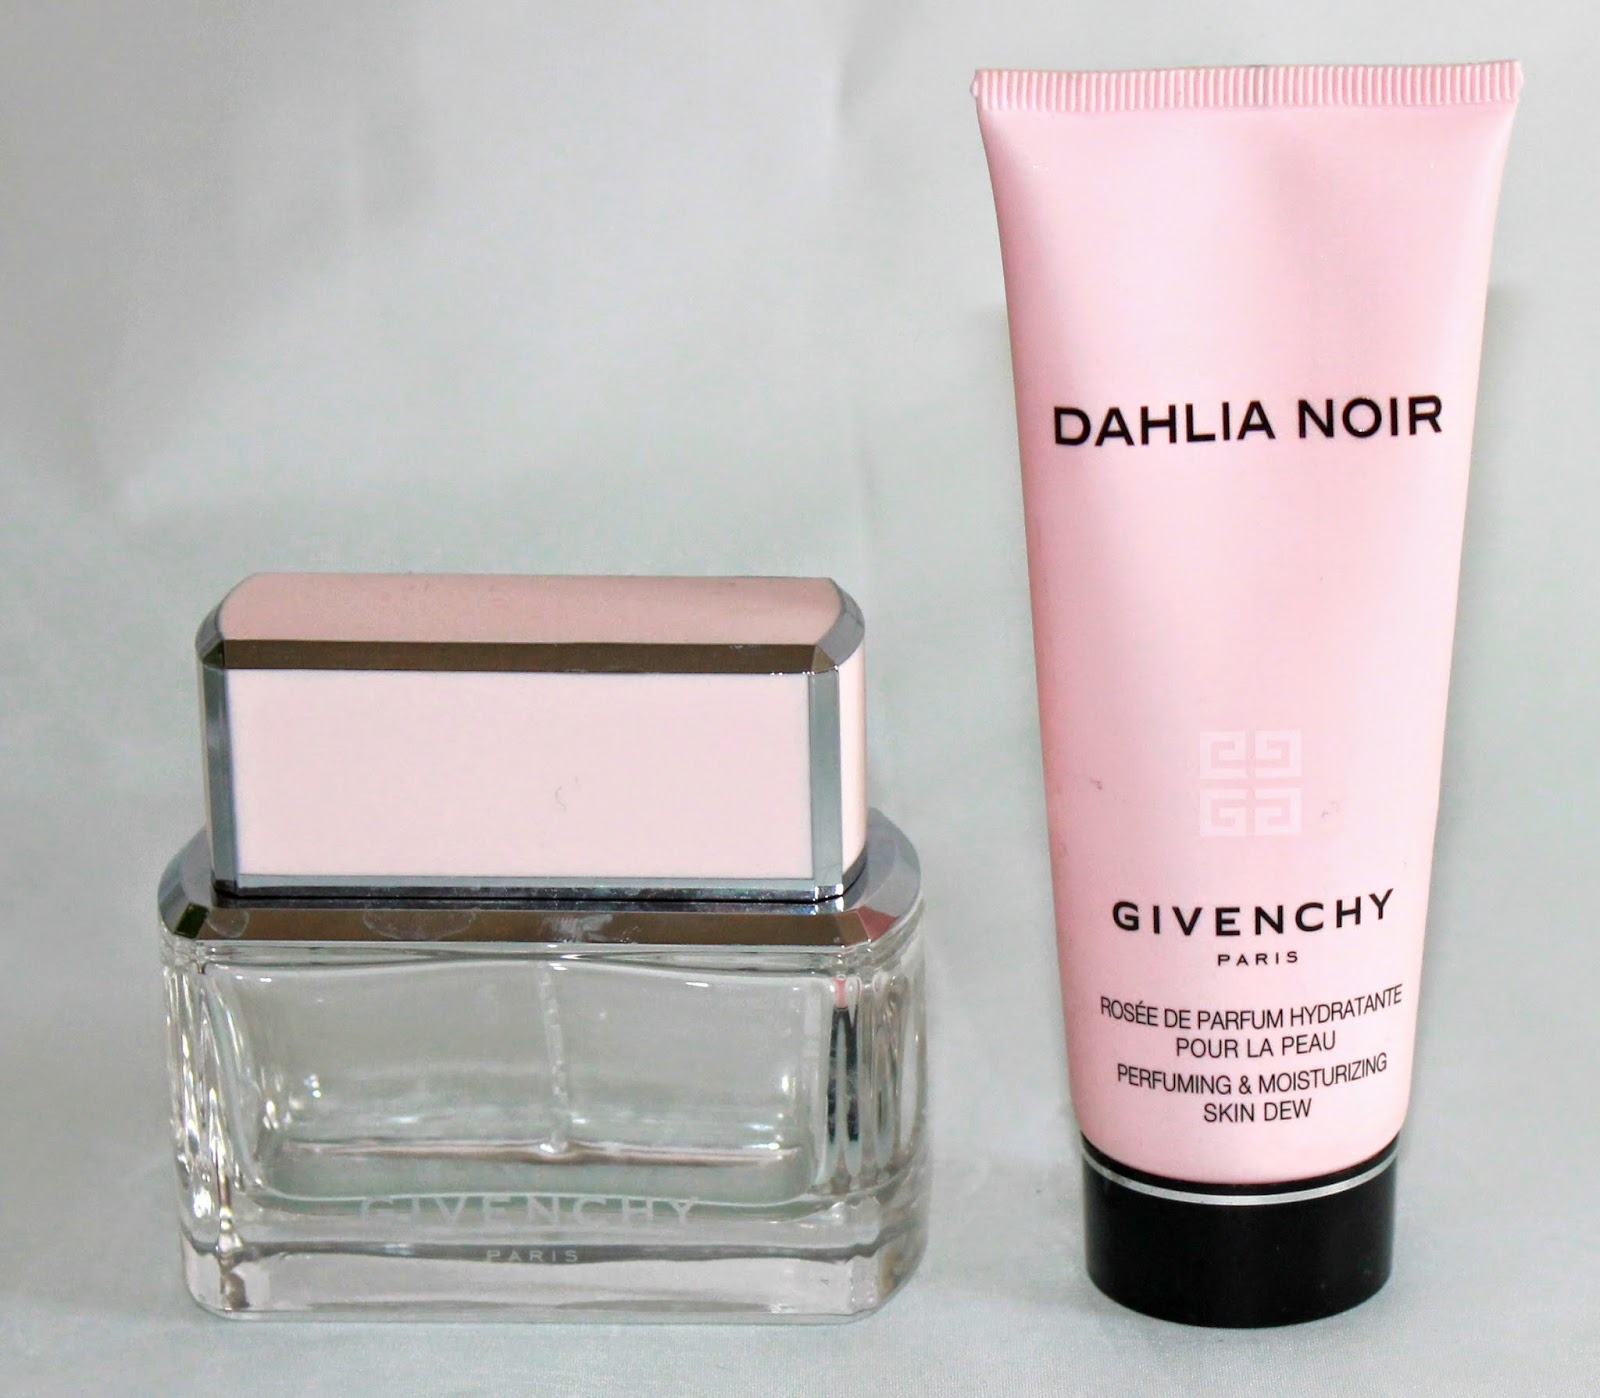 Ma Dahlia Noir Perfume Oil: Beauté Brune: Empties # Juin 2014